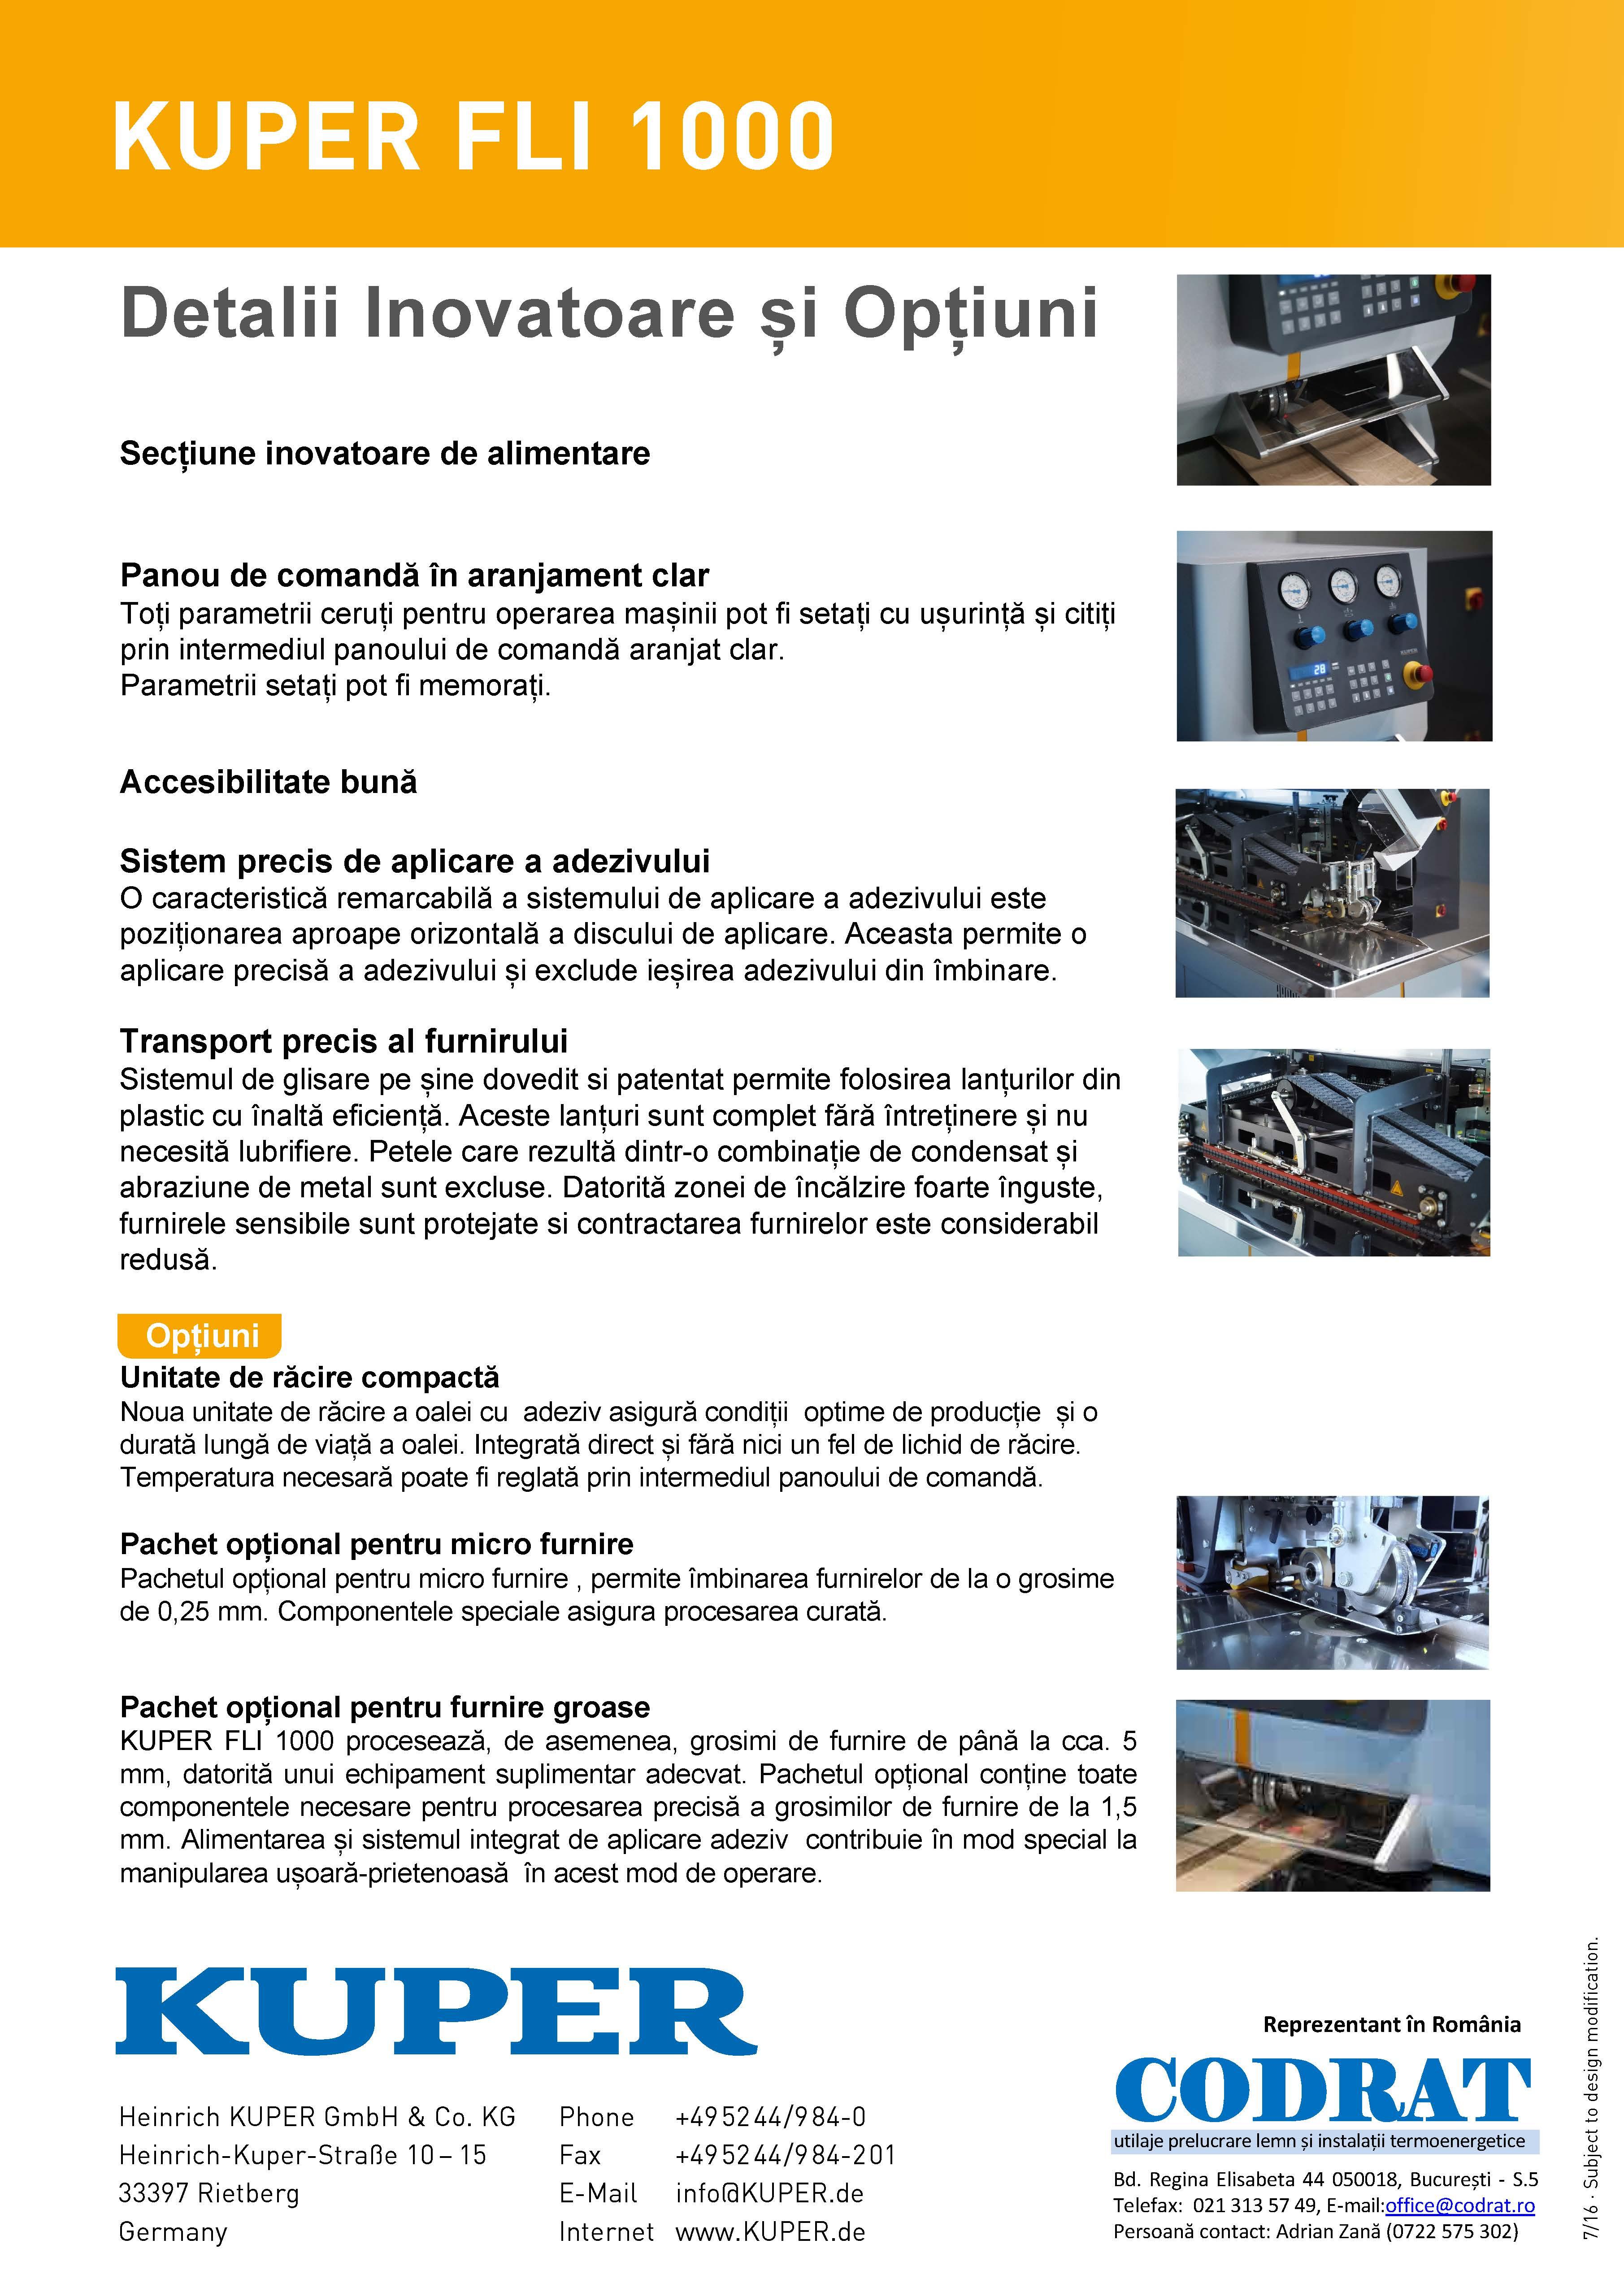 kuper-fli-1000_2016-page_4